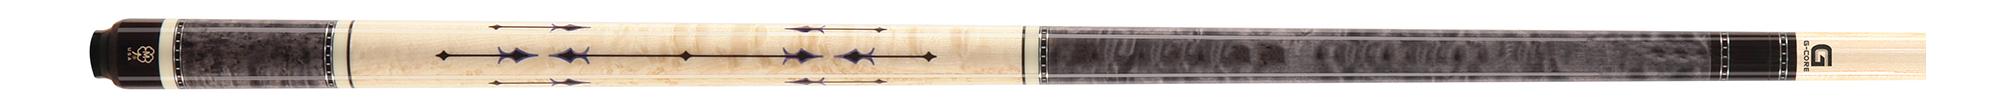 CK0963: McDermott CRM418 Birdseye Titanium Grey/inlay carom #1